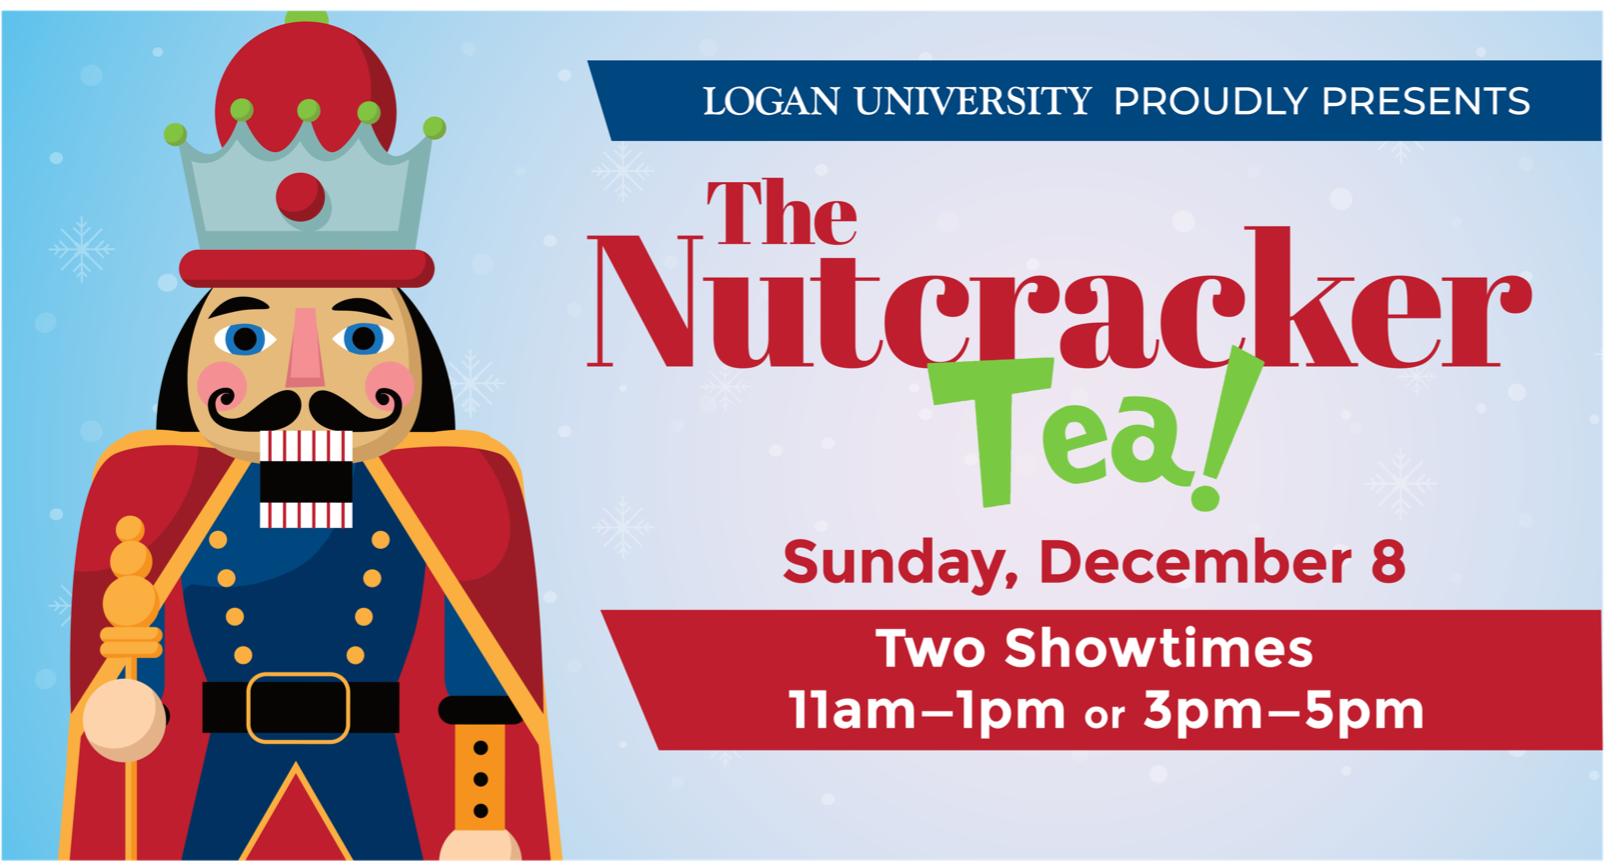 Nutcracker Tea flyer image.